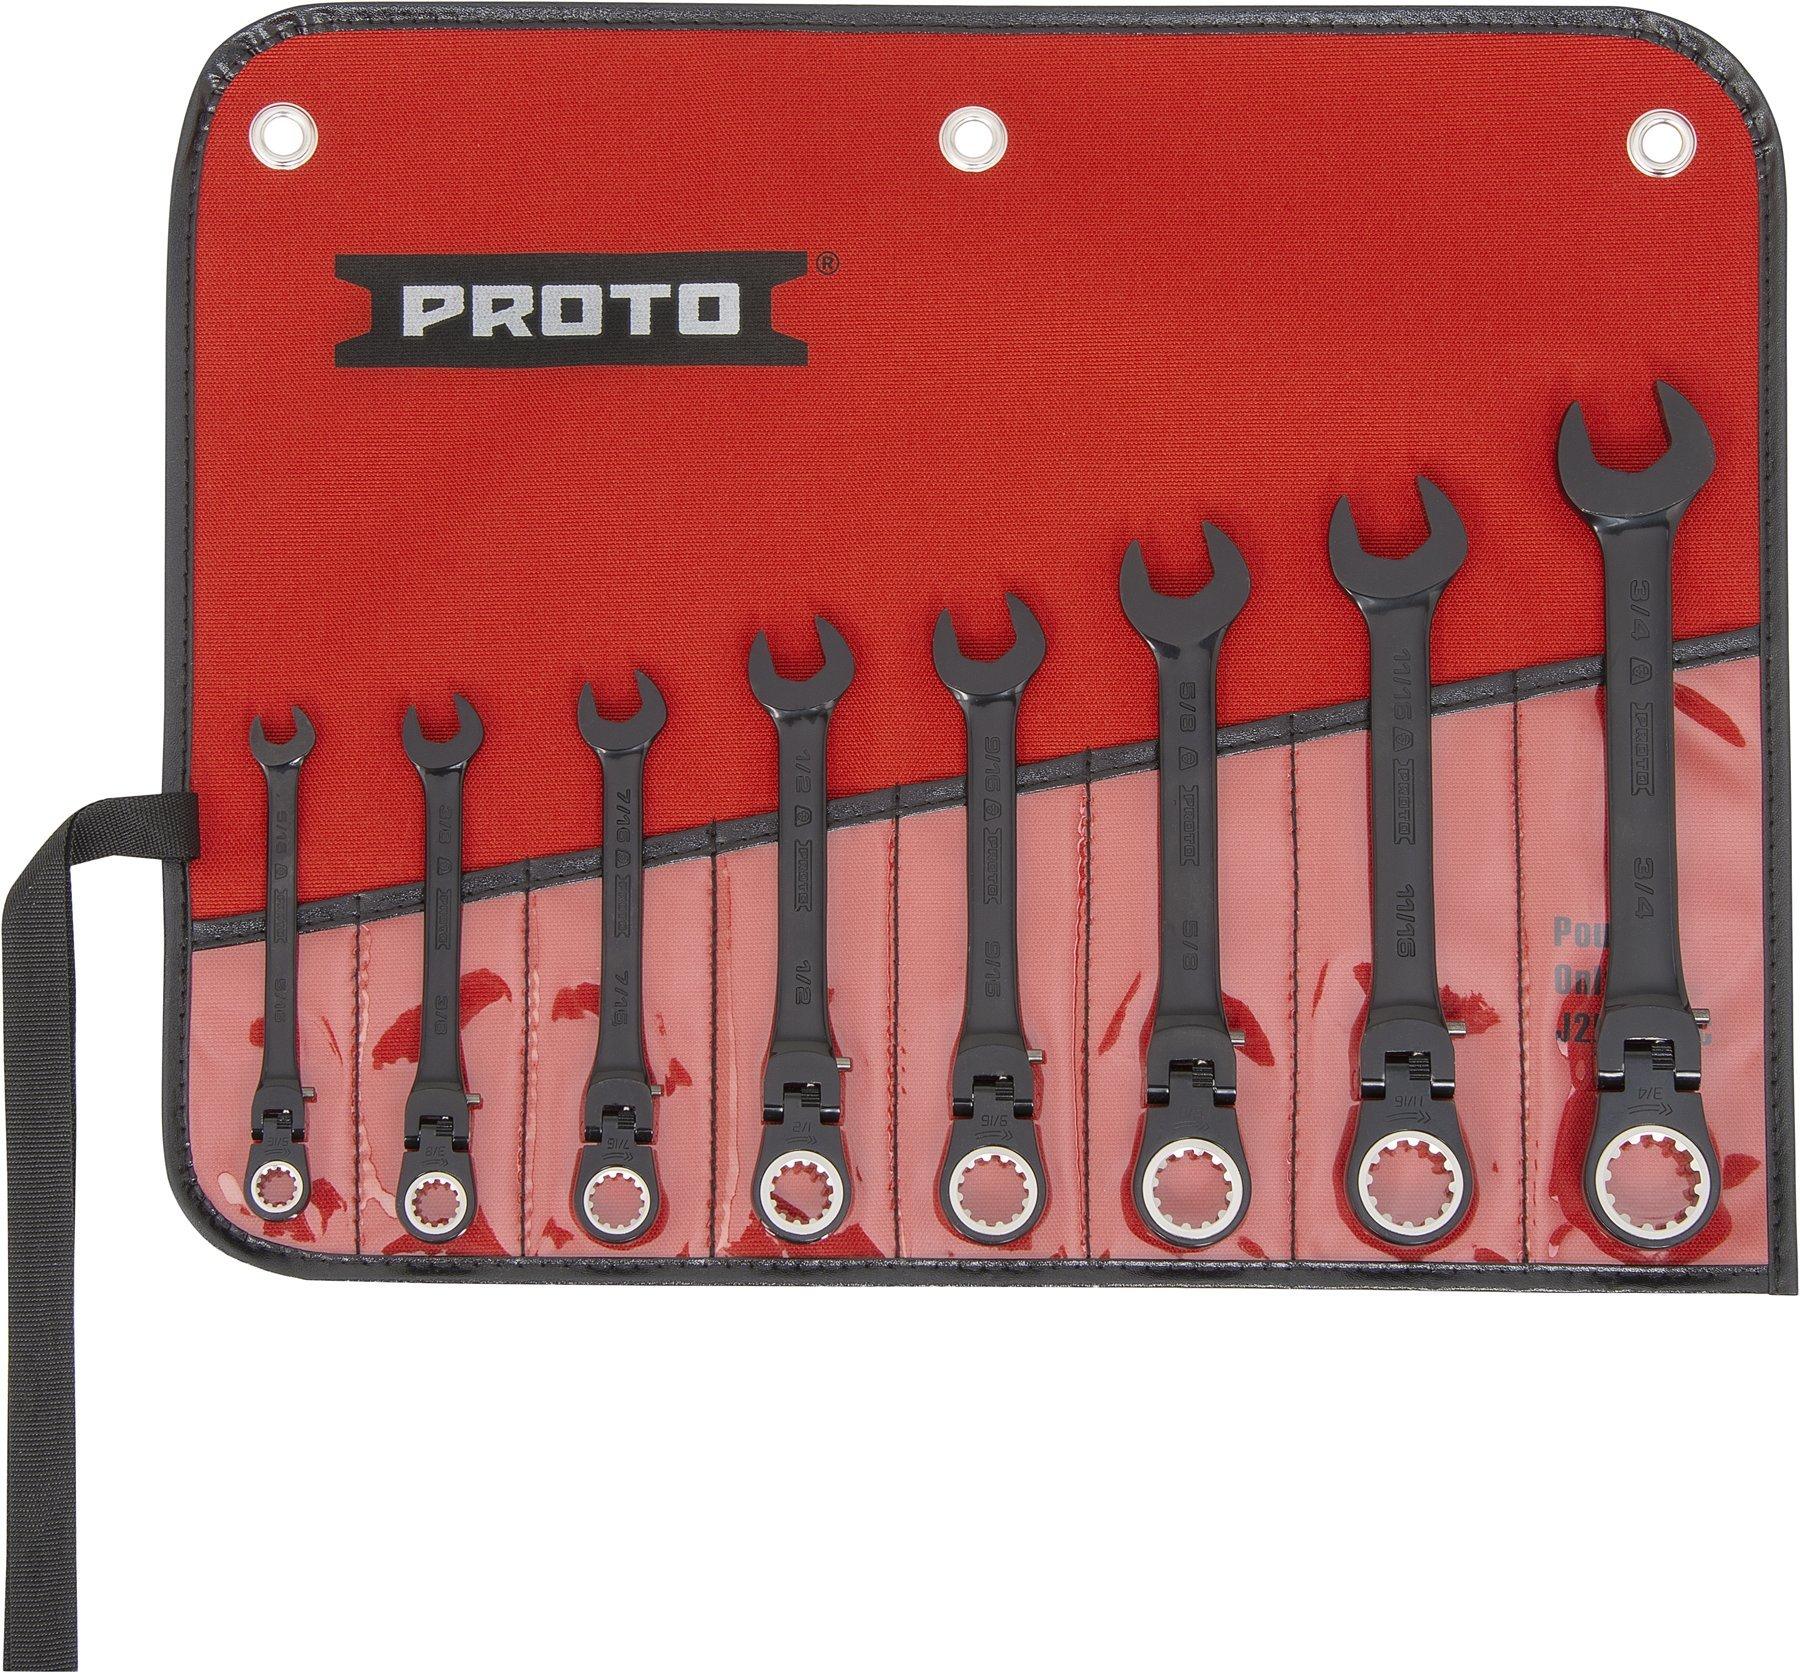 Stanley Proto Industrial JSCVF-8S Black Flexible 8 Piece Ratchet Wrench Set